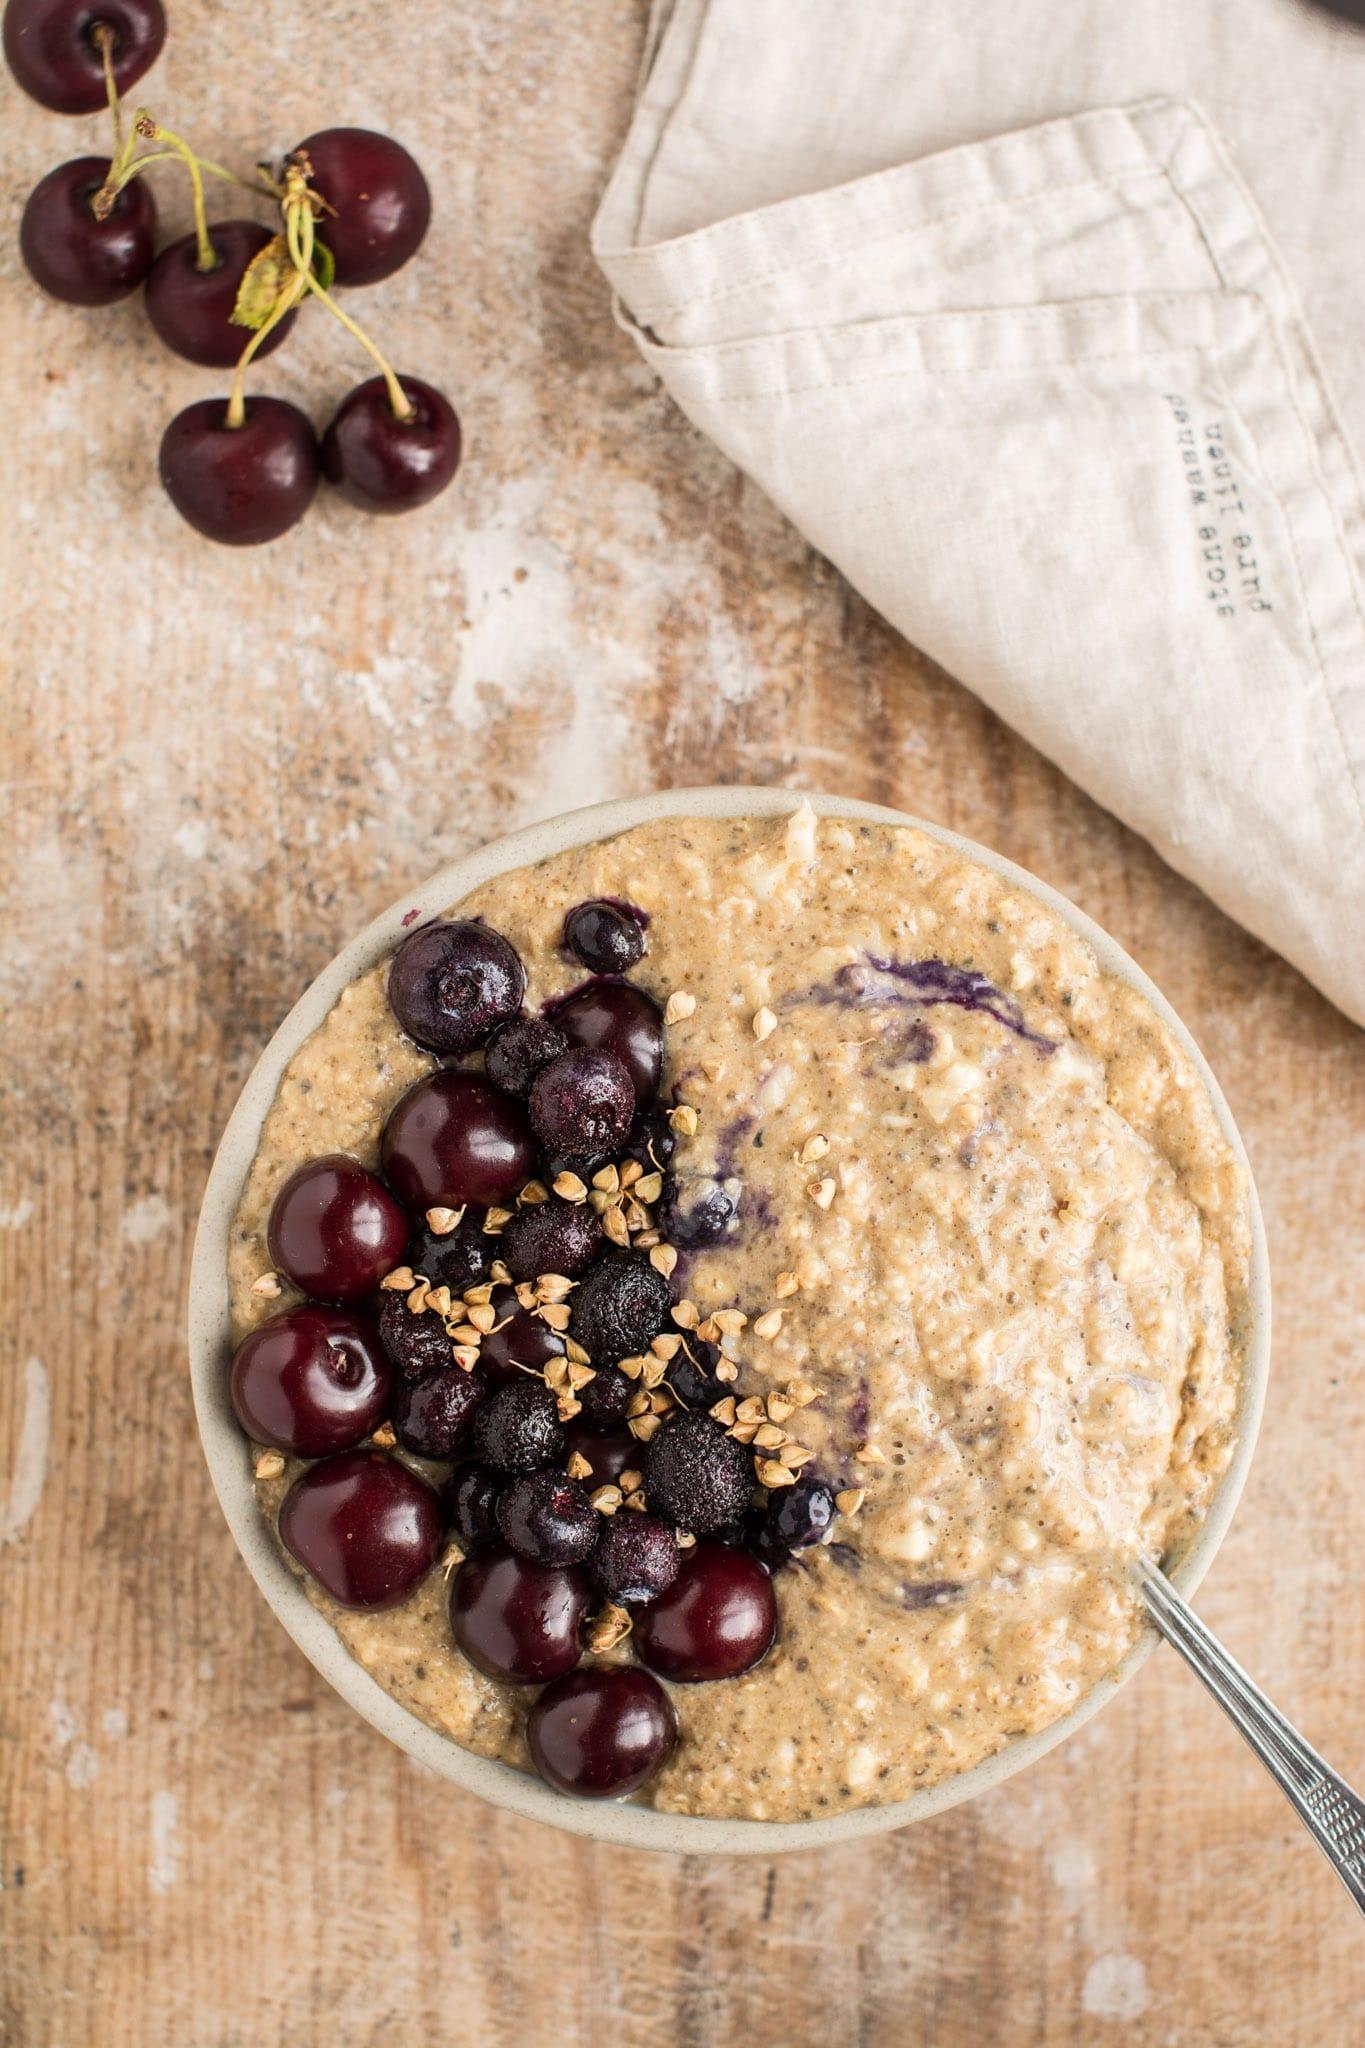 Dr. Greger's Daily Dozen meal plan Cauliflower Oatmeal